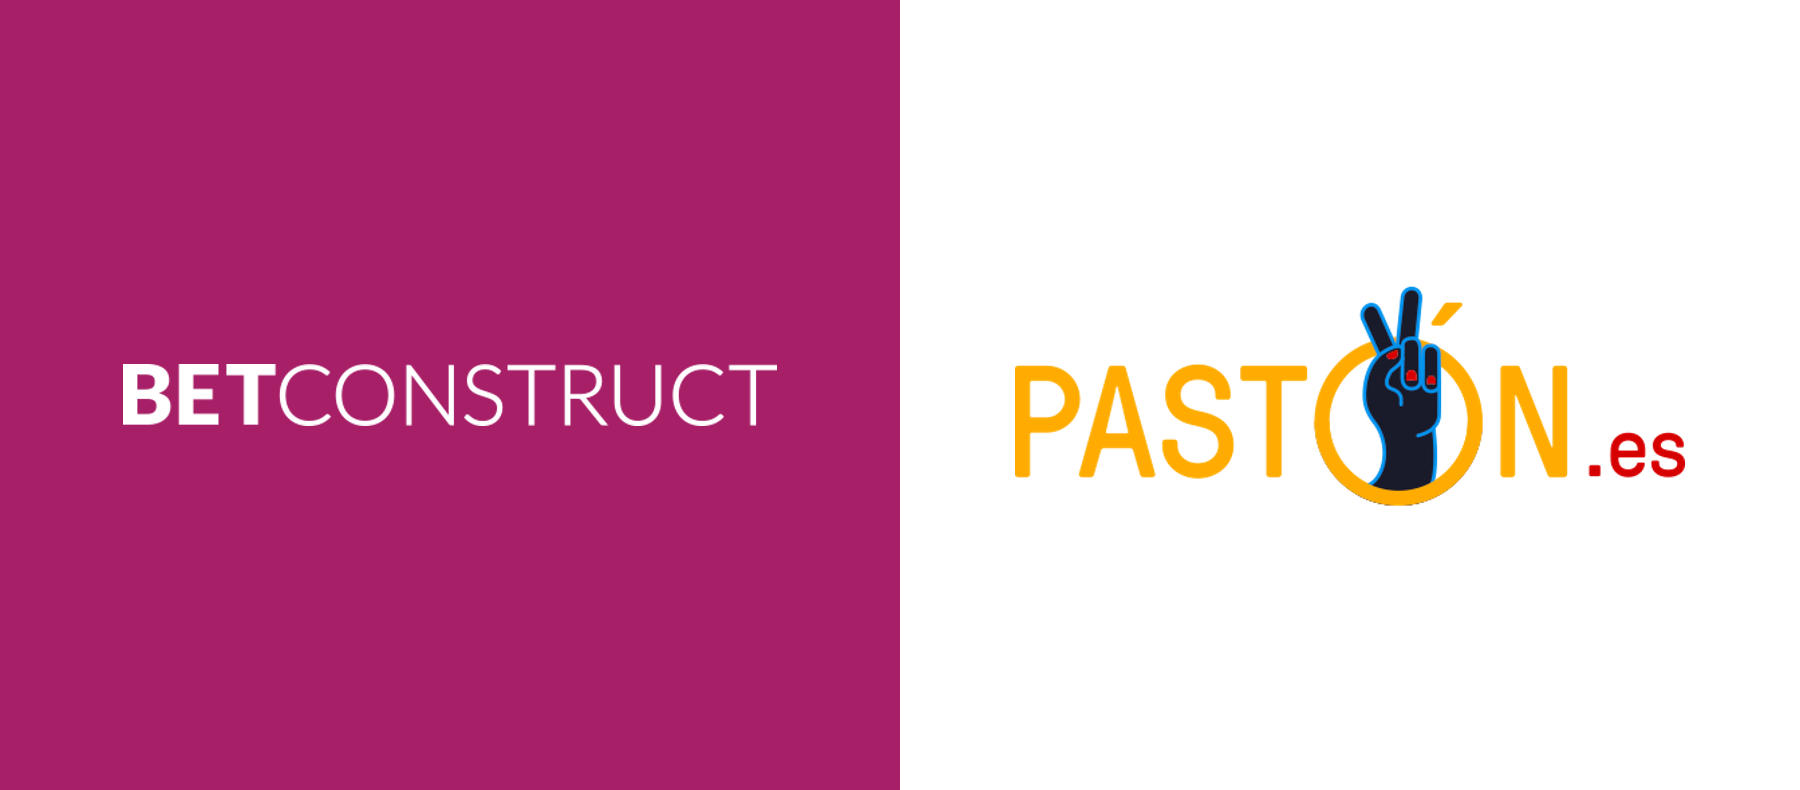 betconstruct live paston.es